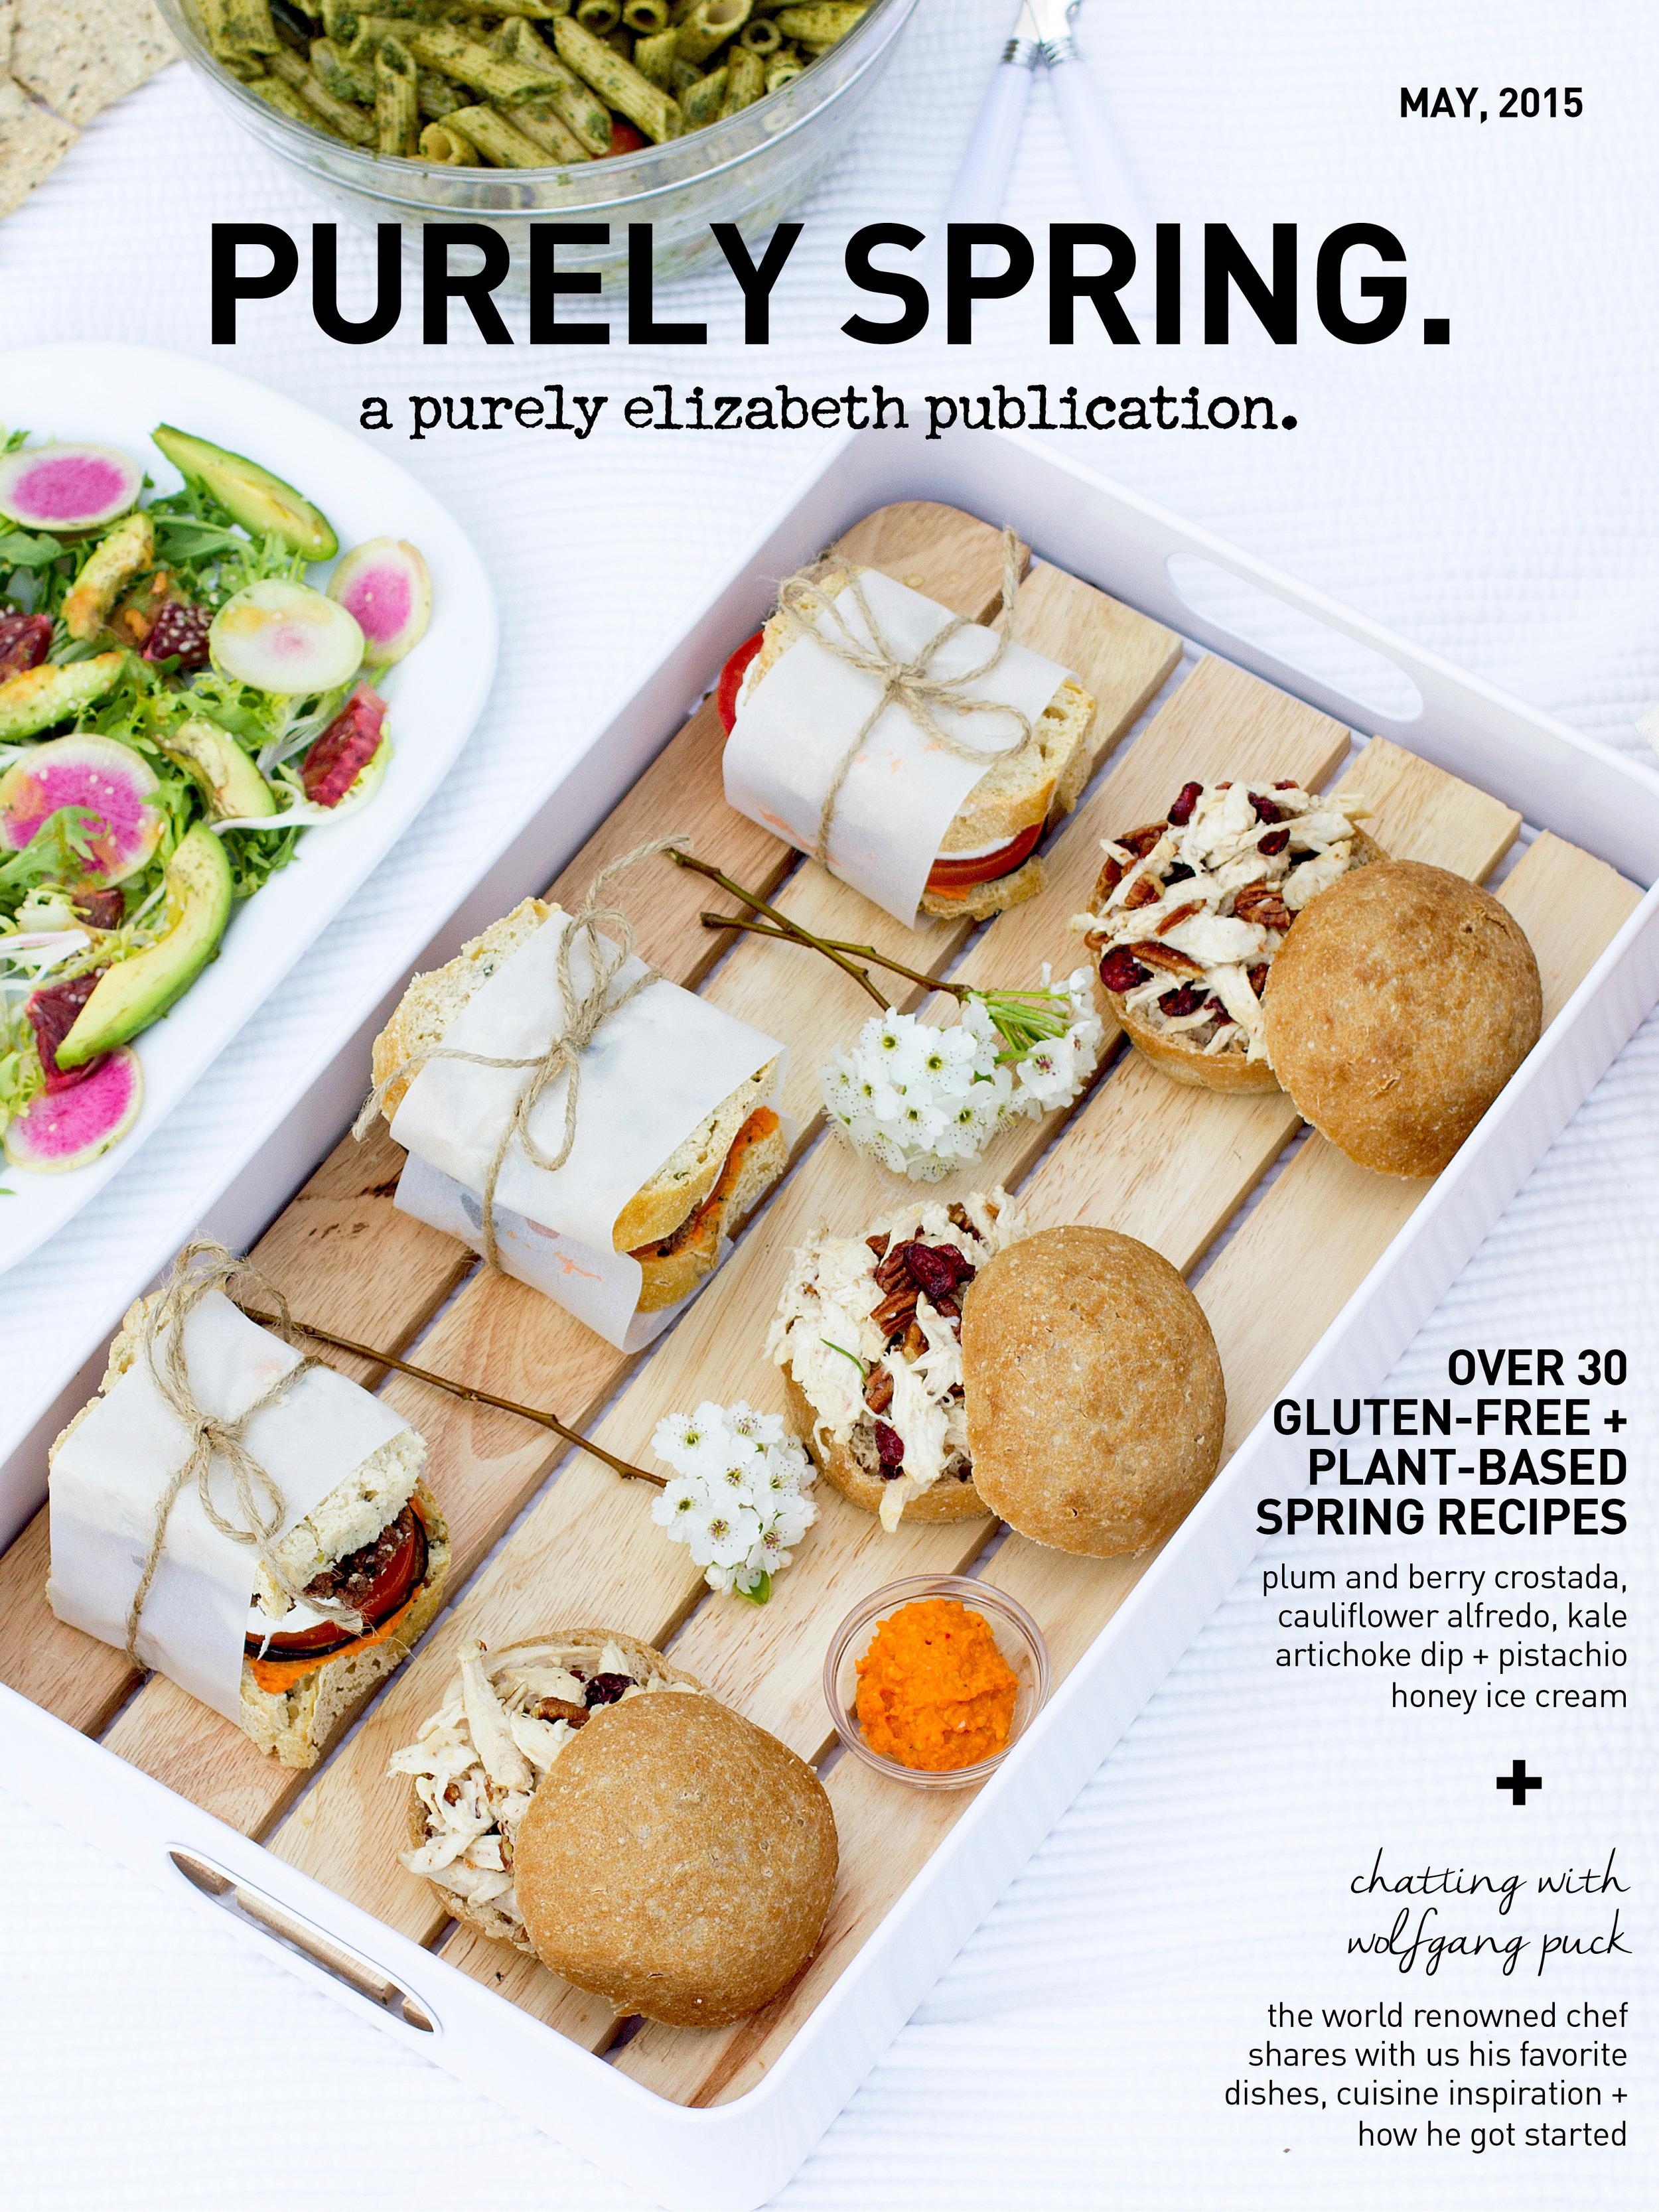 purely elizabeth's  purely spring  issue. Online magazine  here .